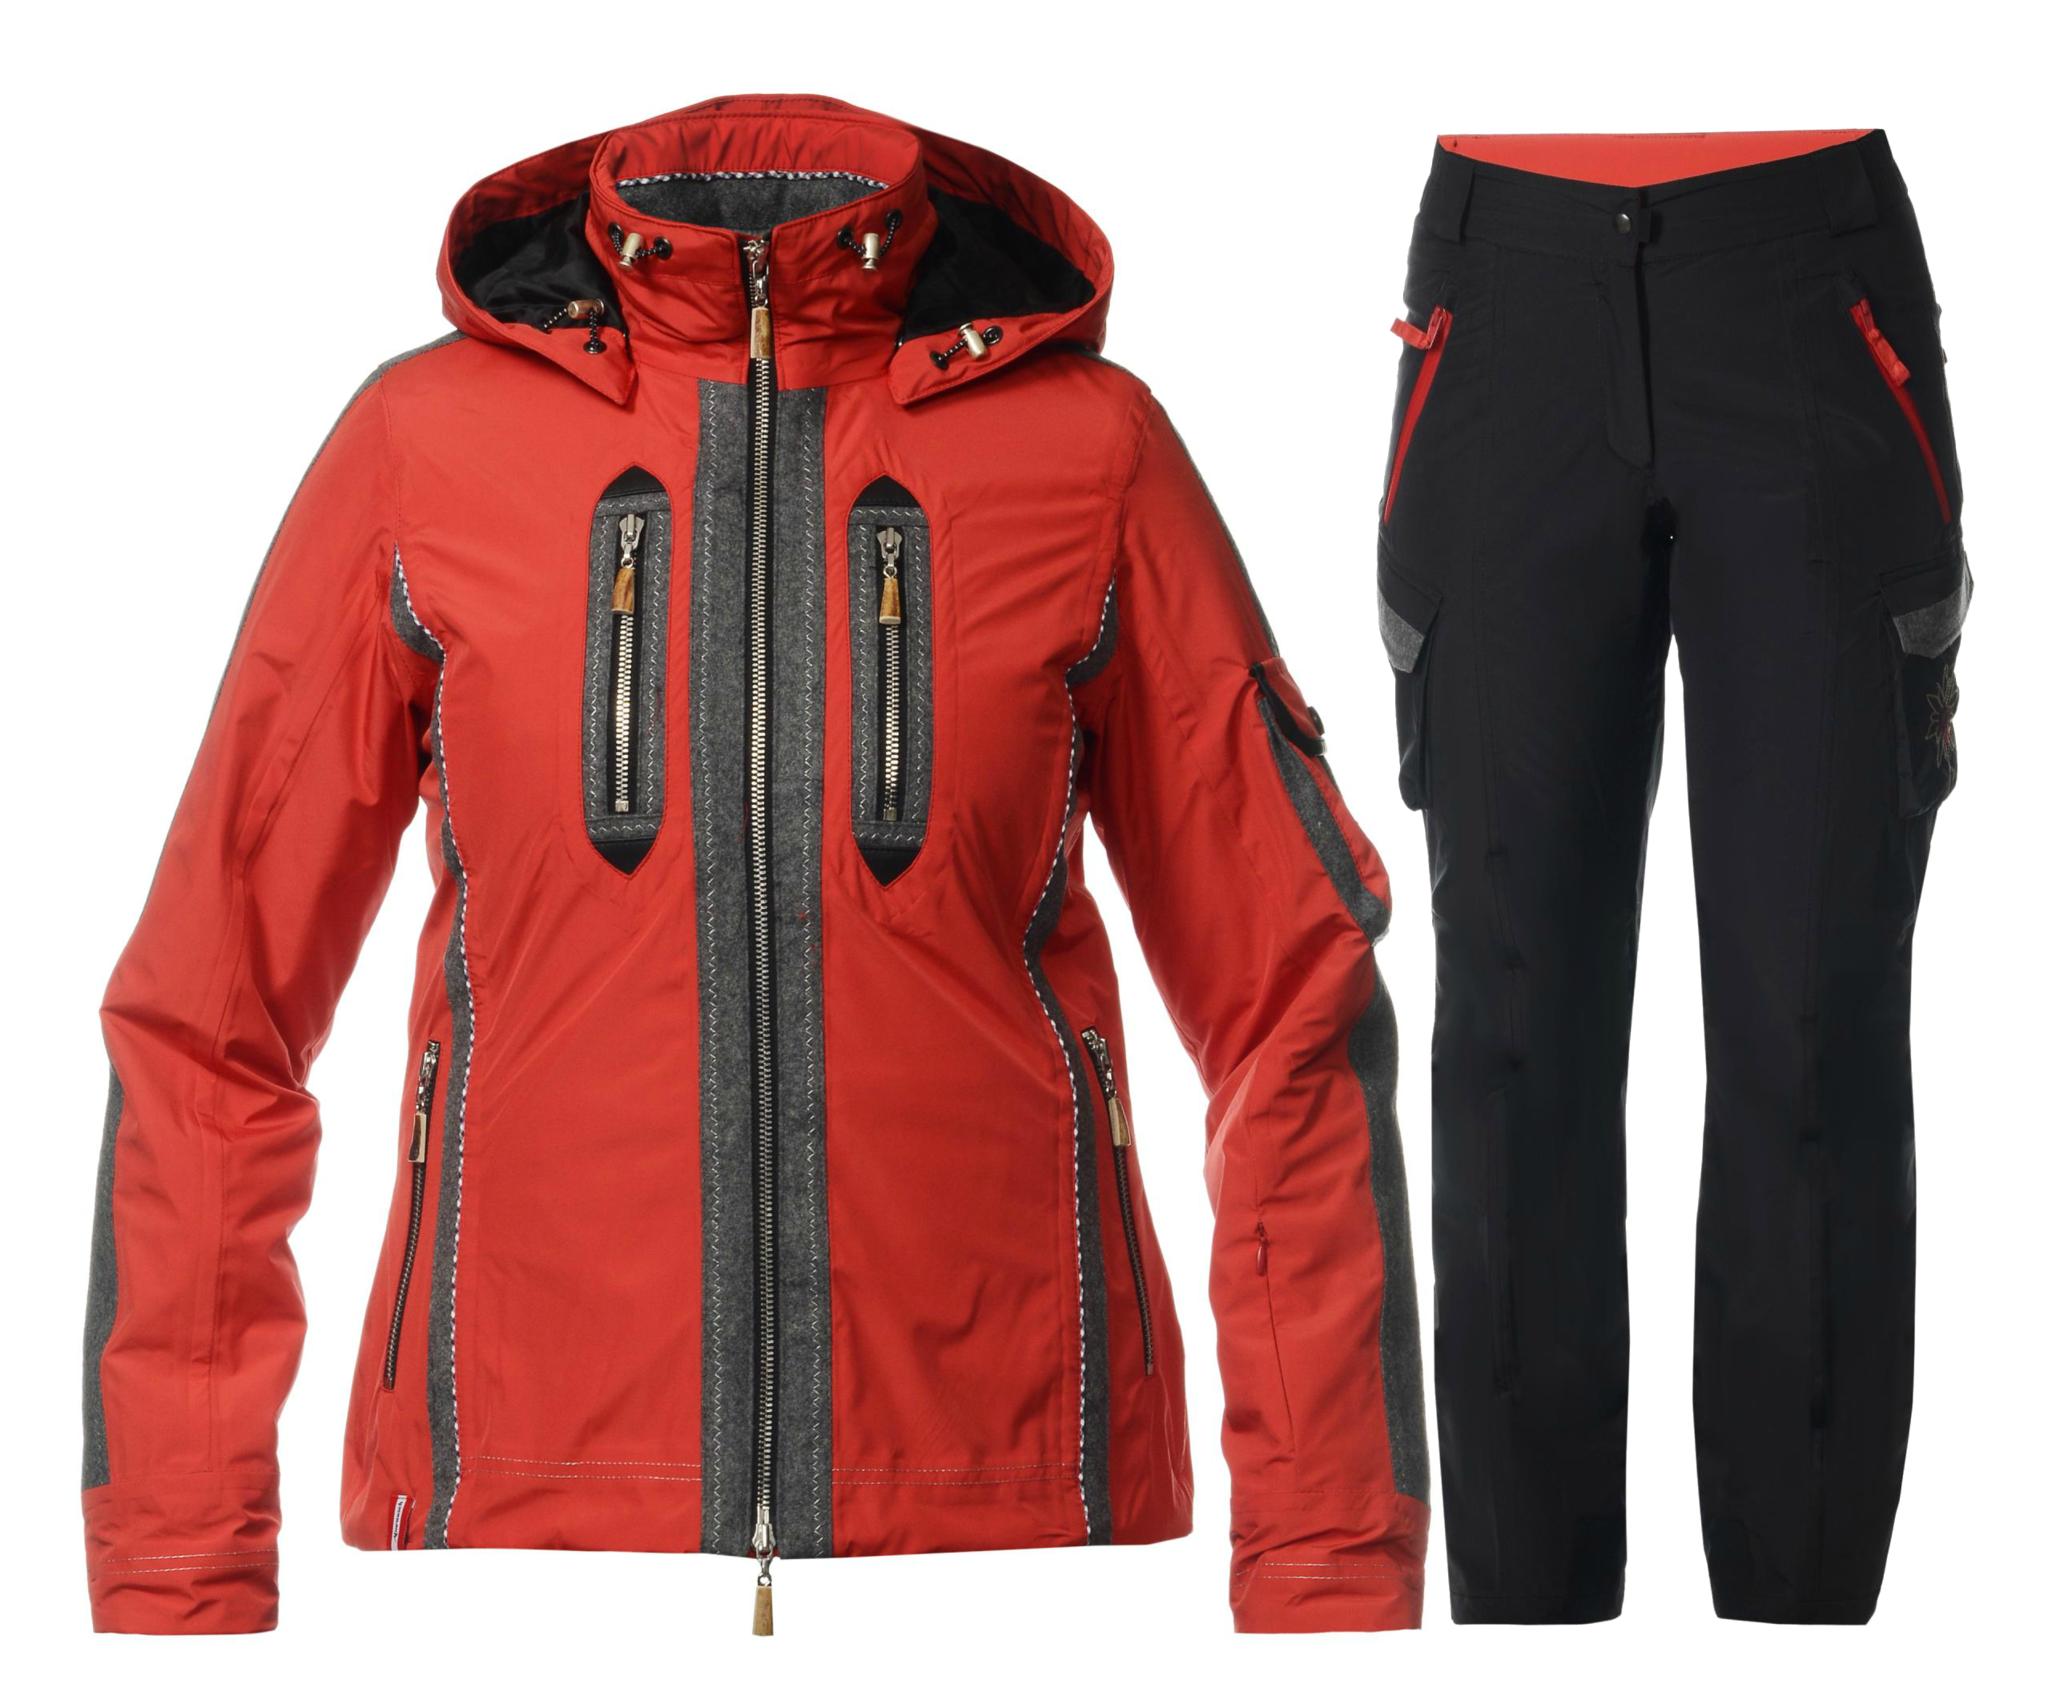 Женский горнолыжный костюм Almrausch Manning-Hochegg красный